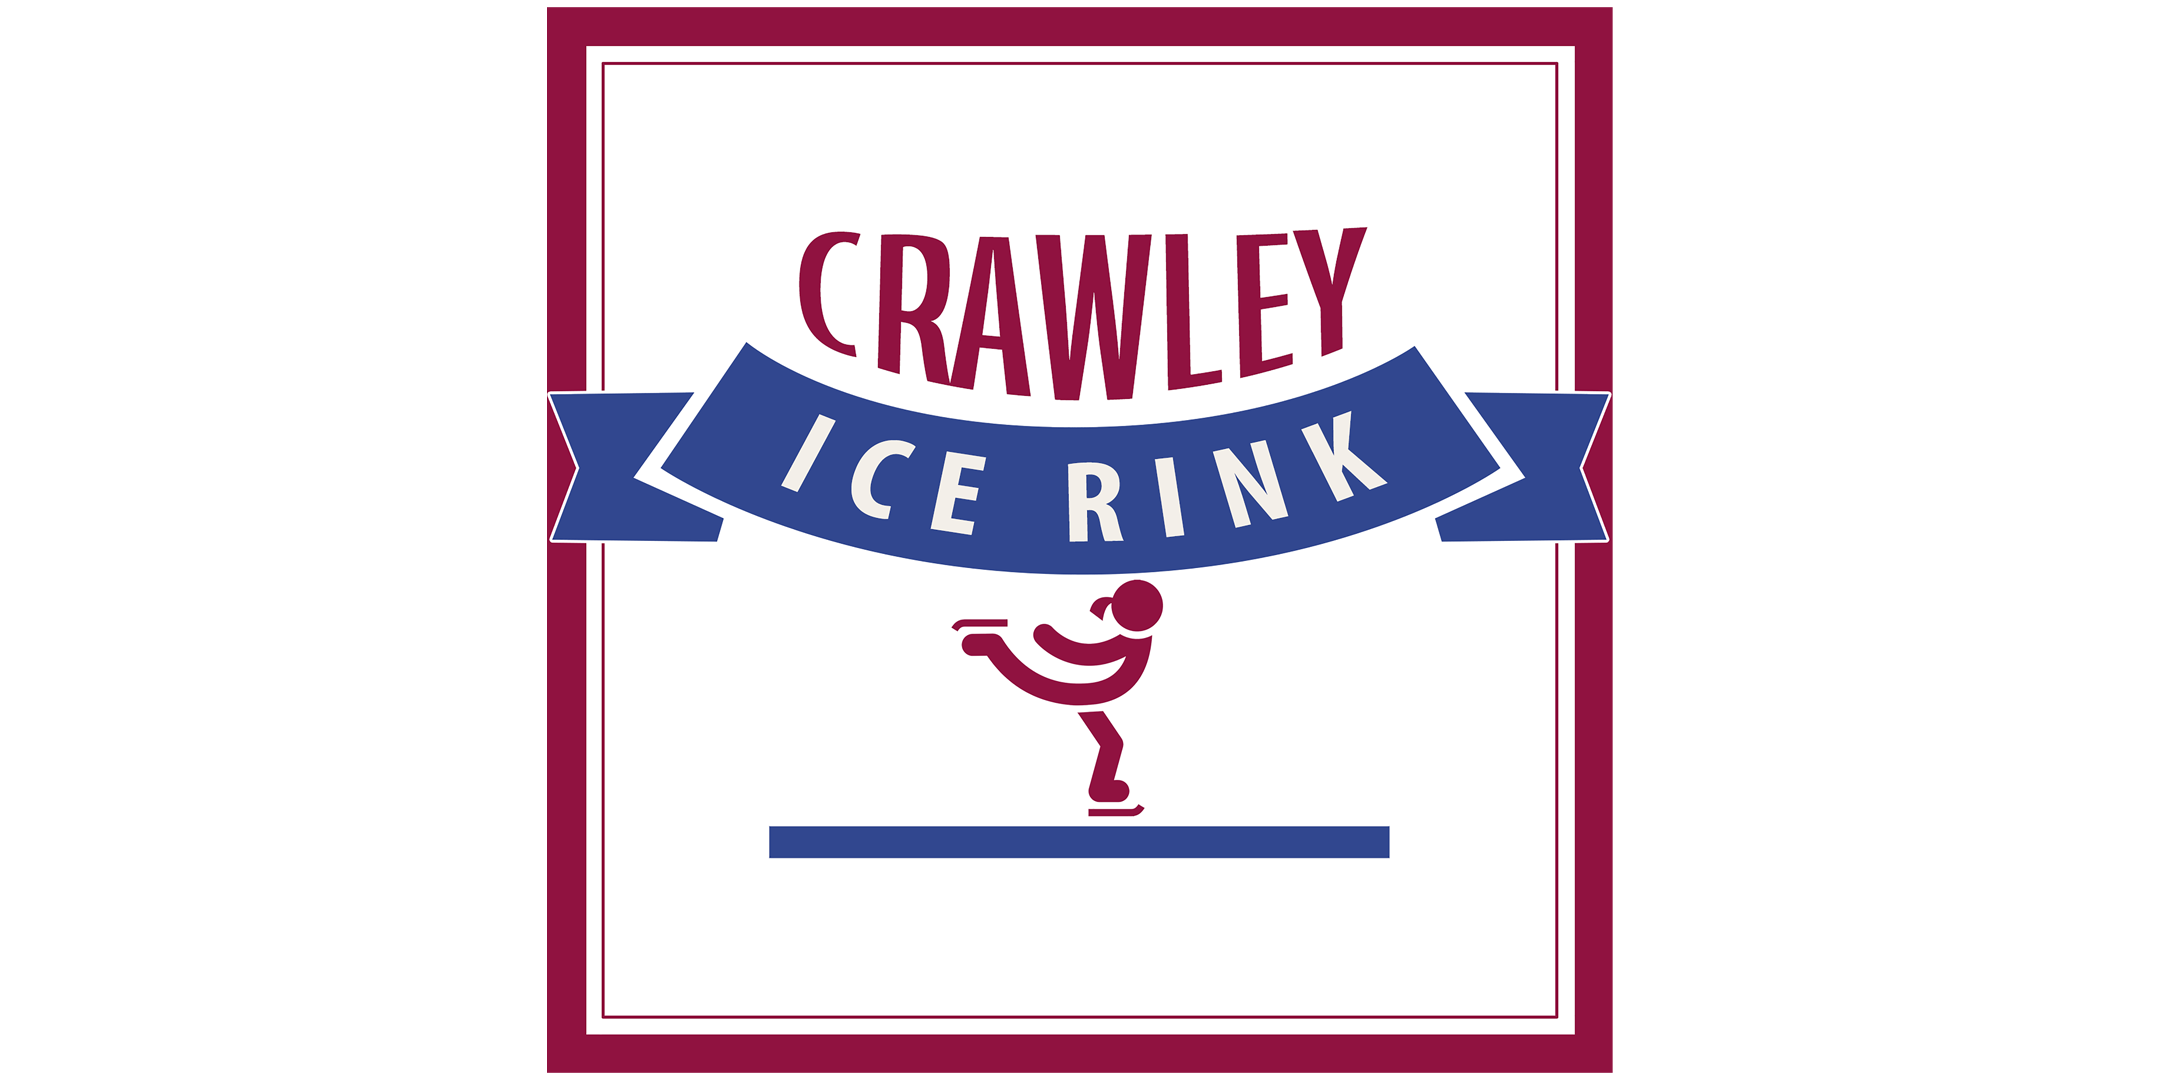 Crawley Ice Rink - 18th December (Off Peak)